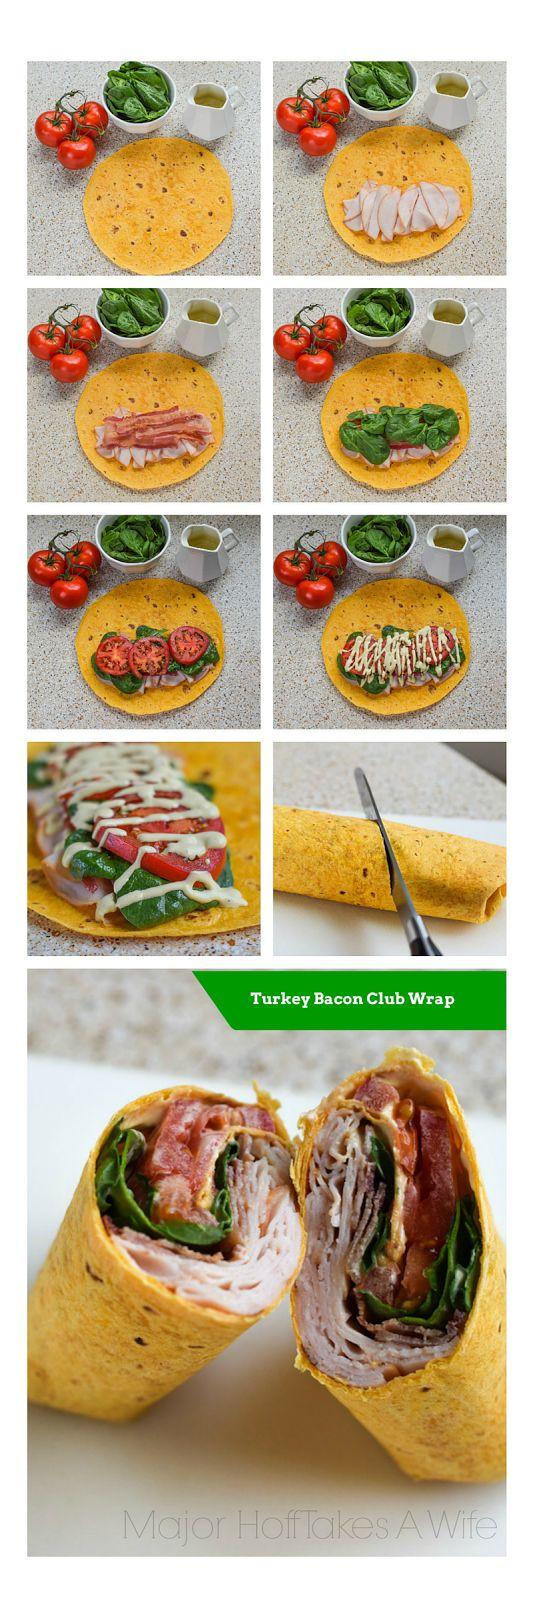 Turkey Bacon Club Wrap featuring Hidden Valley Ranch Avocado Dressing